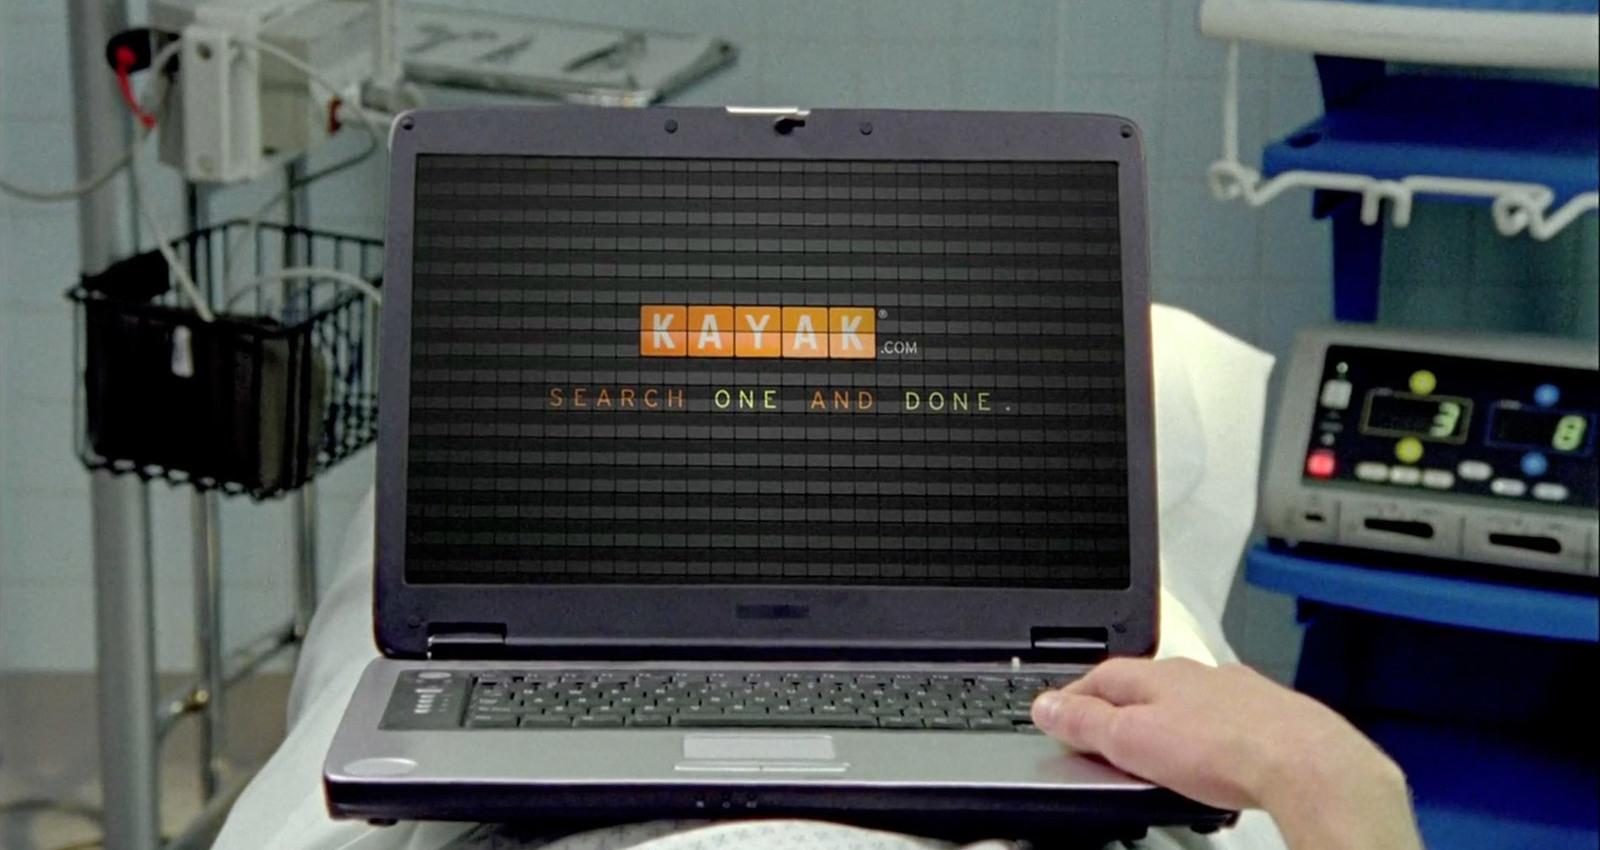 KAYAK - Television Campaign